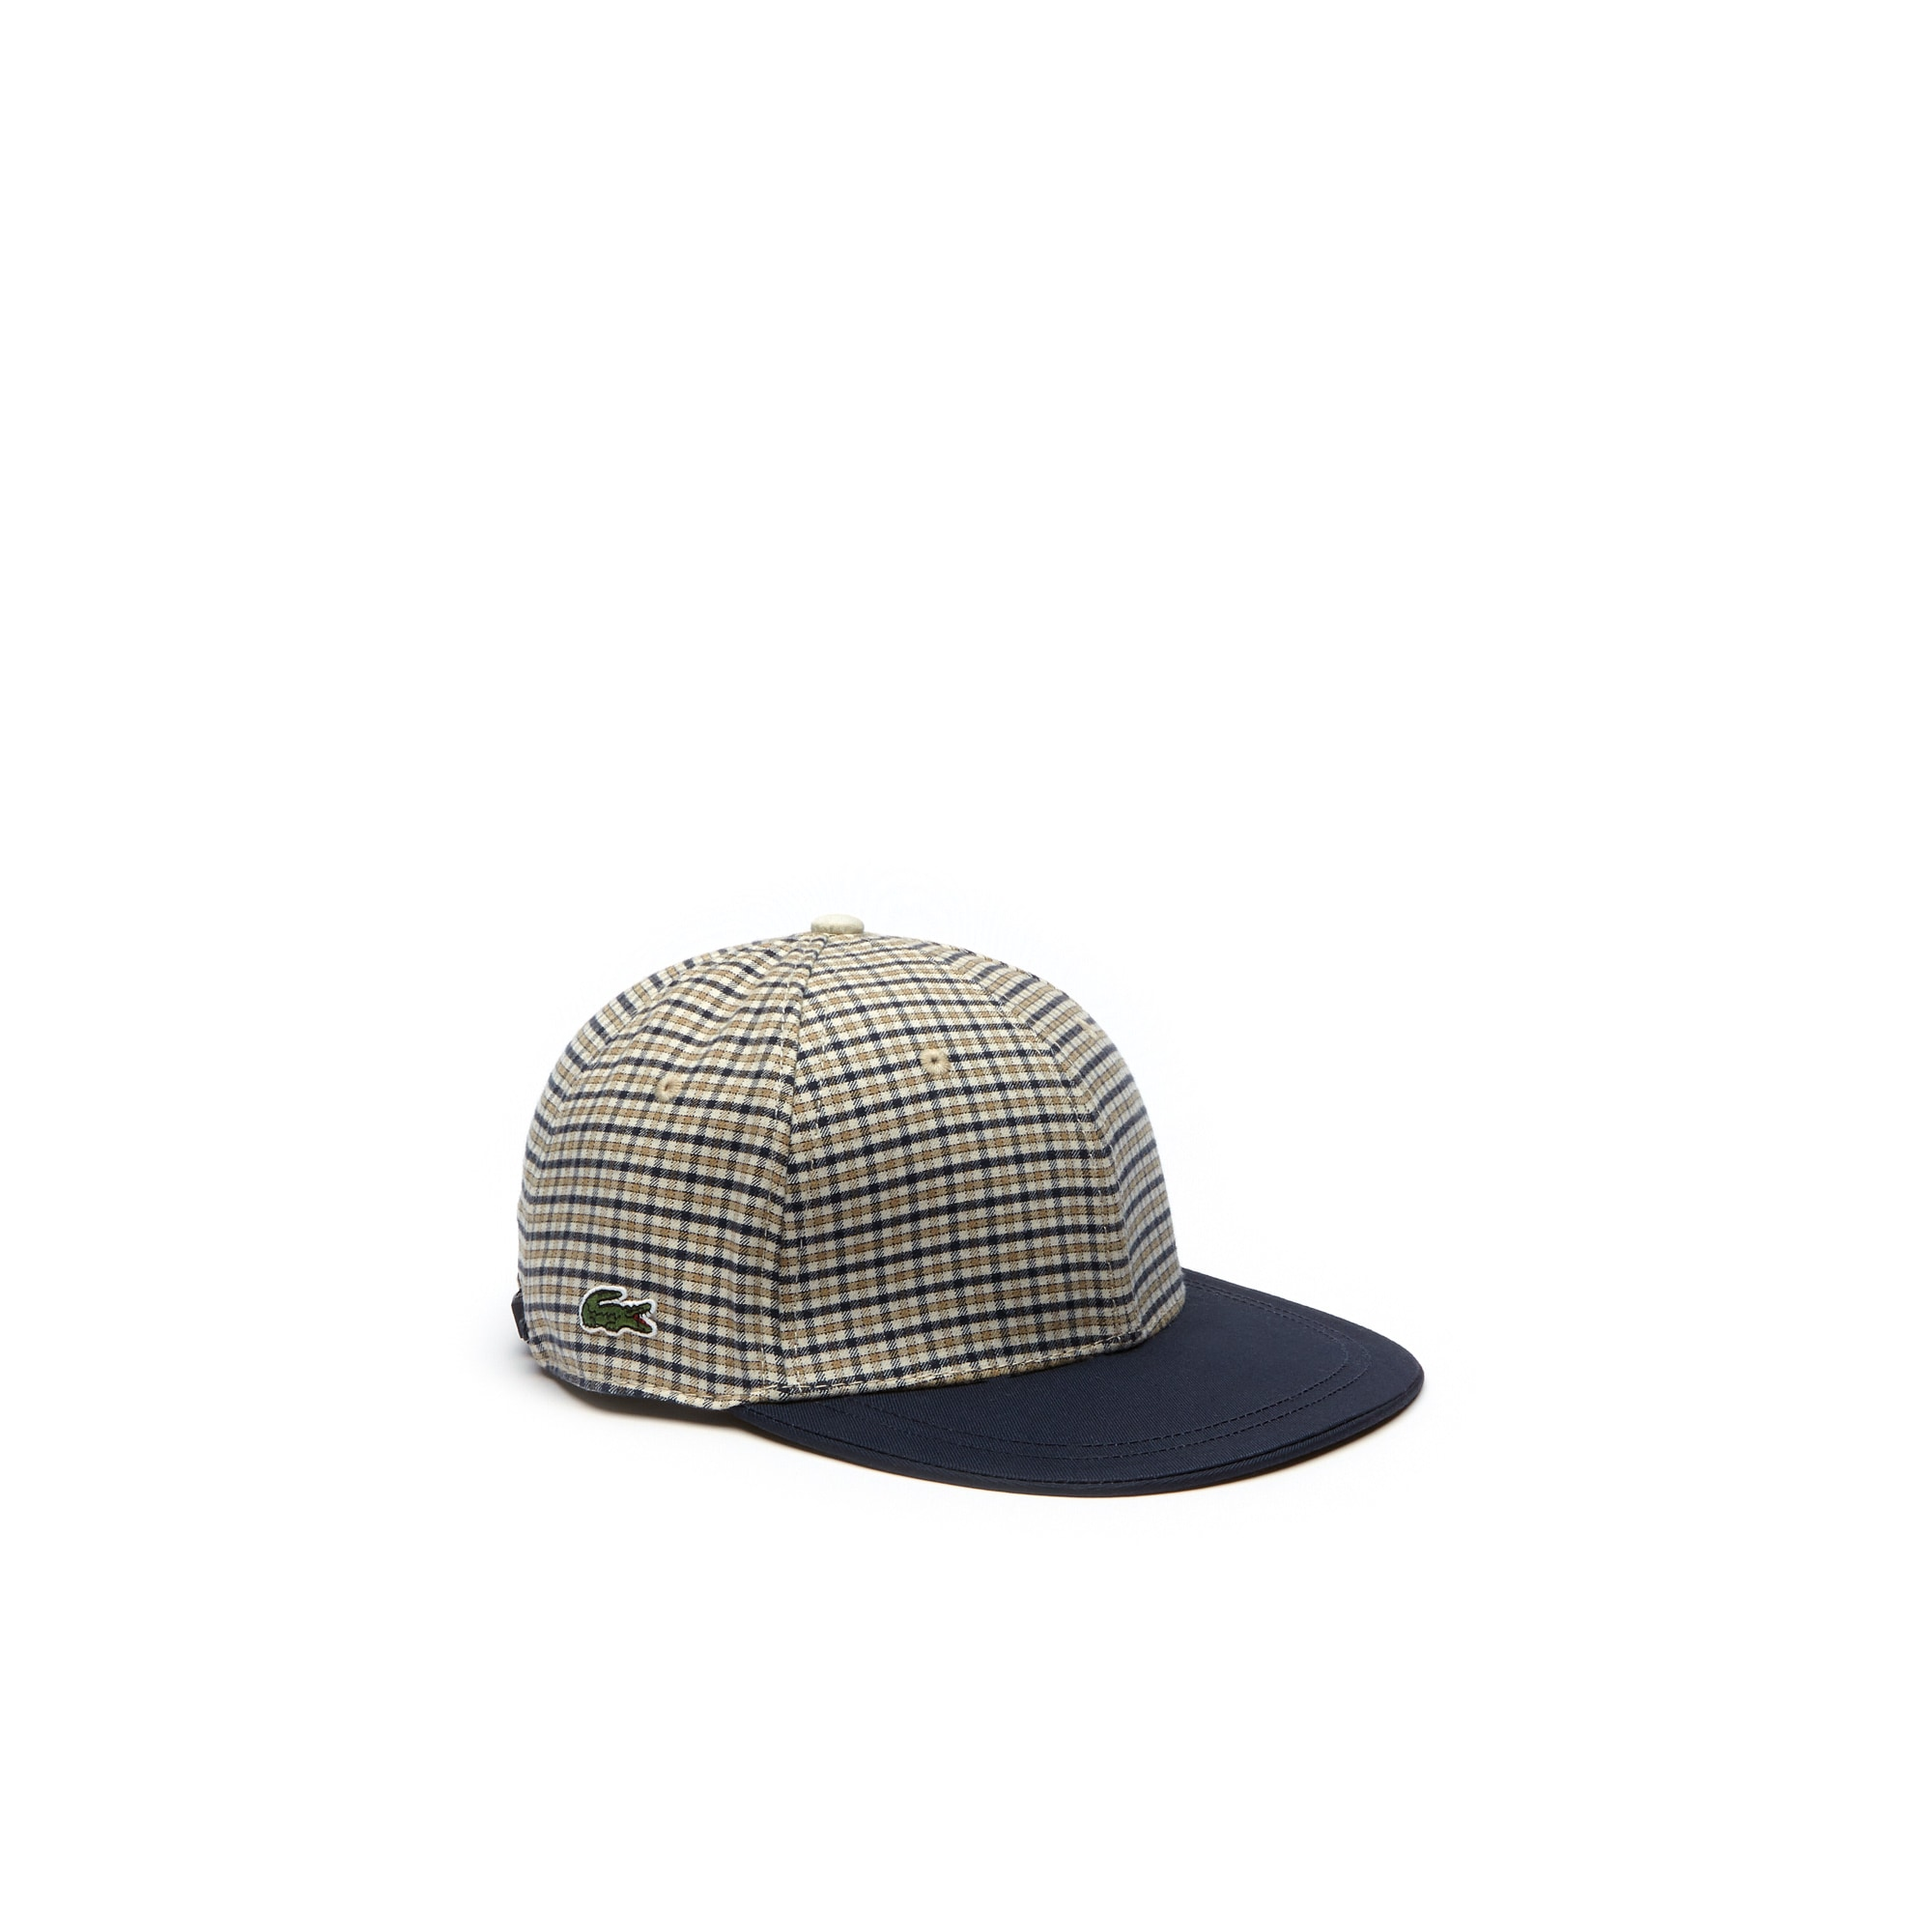 LACOSTE L!VE Kappe mit Kontrast-Schirm aus Karo-Flanell